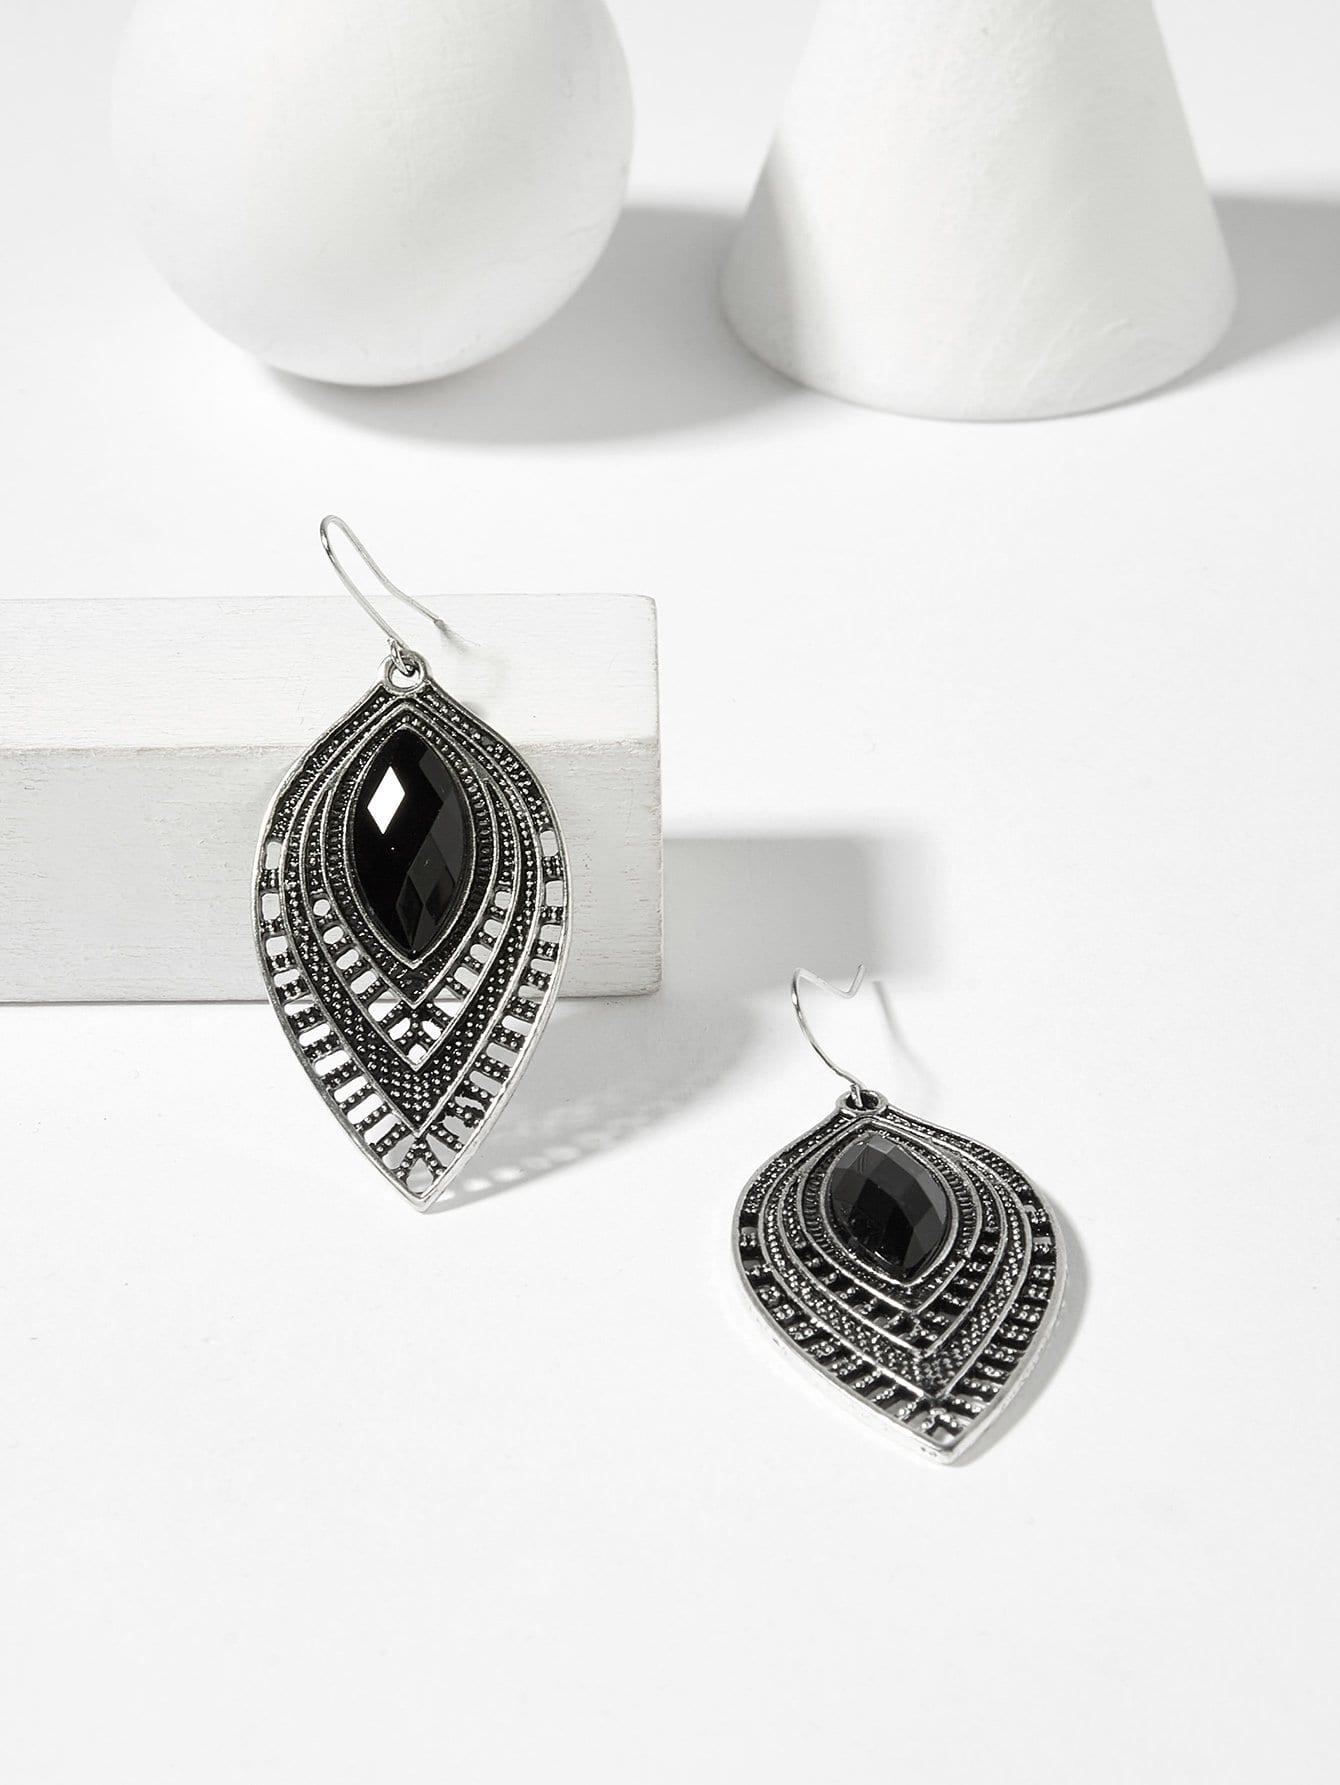 76e5efac11 Gemstone Engraved Hollow Drop Earrings